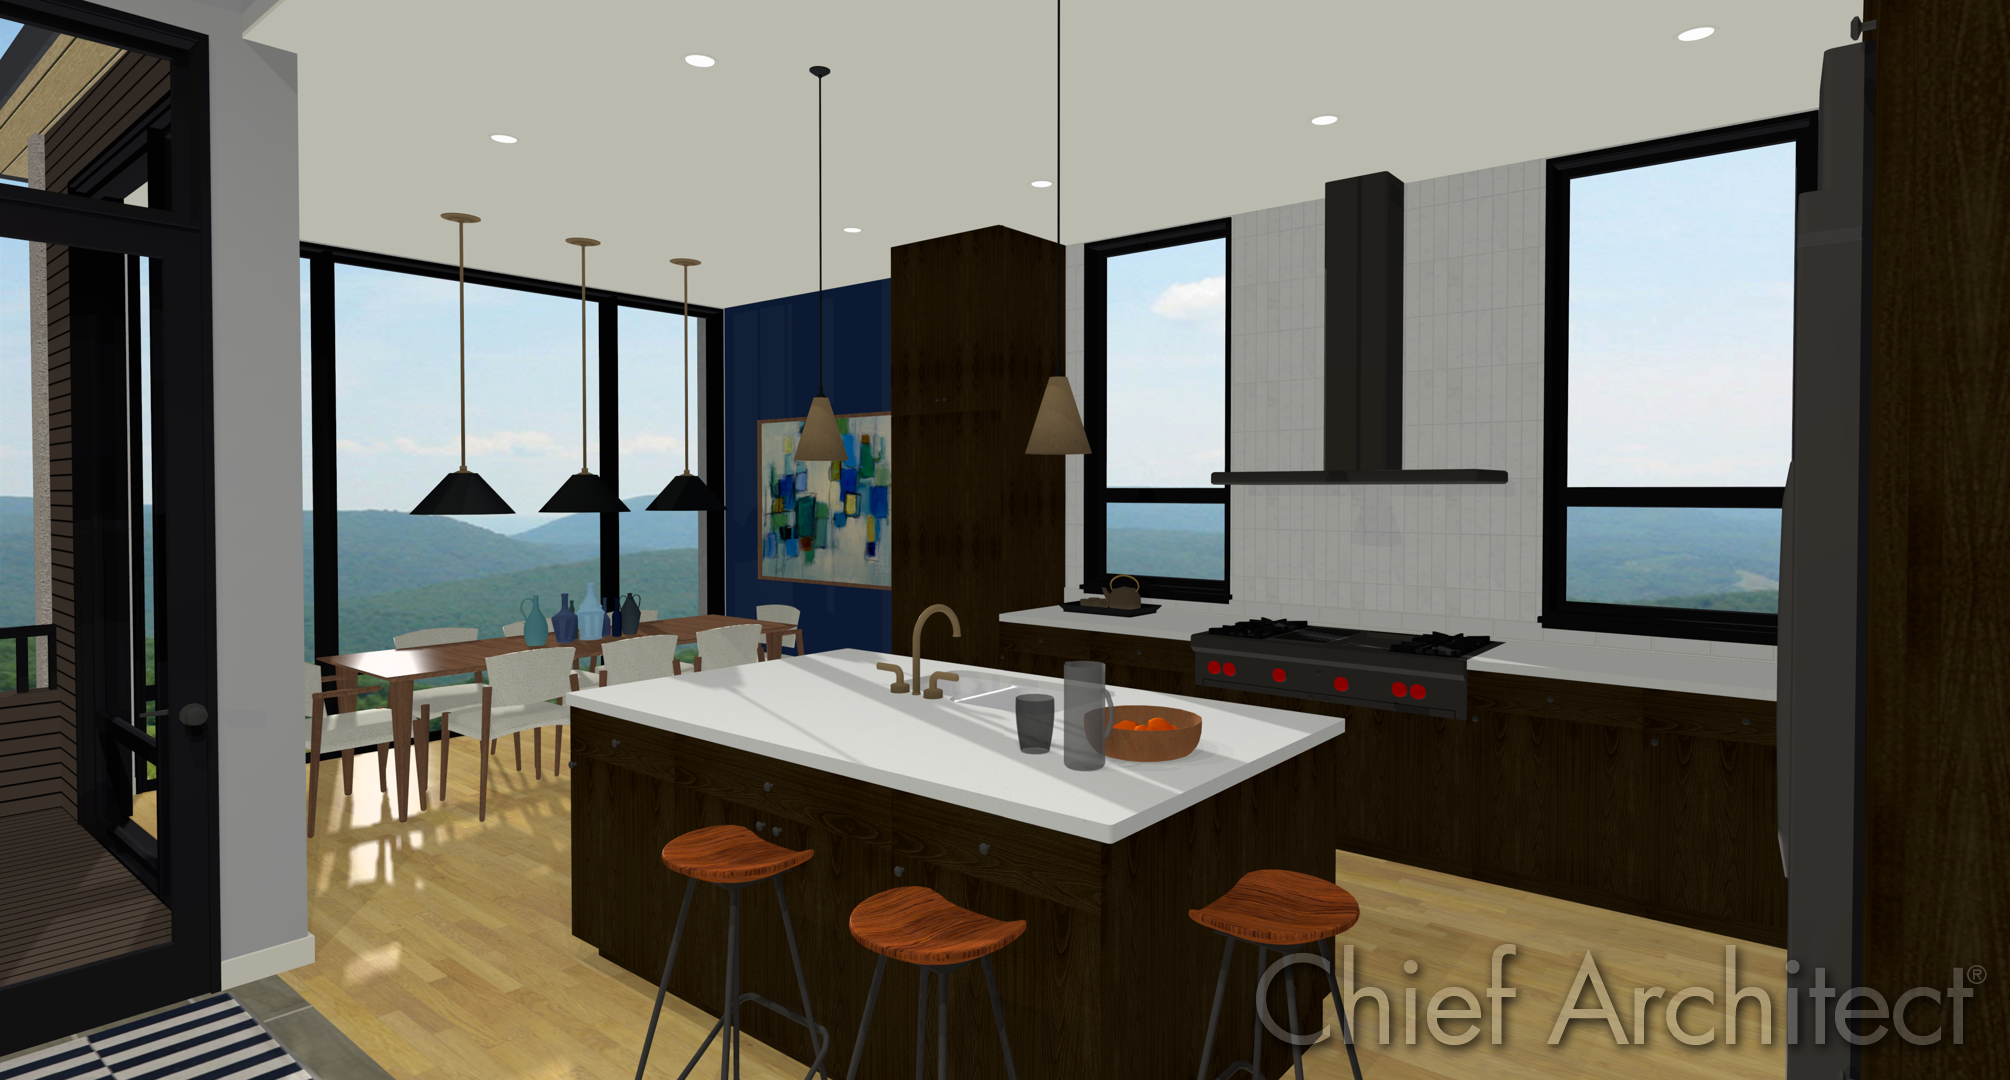 home designer architectural 2016 mac software computer hgtv home design software for mac download